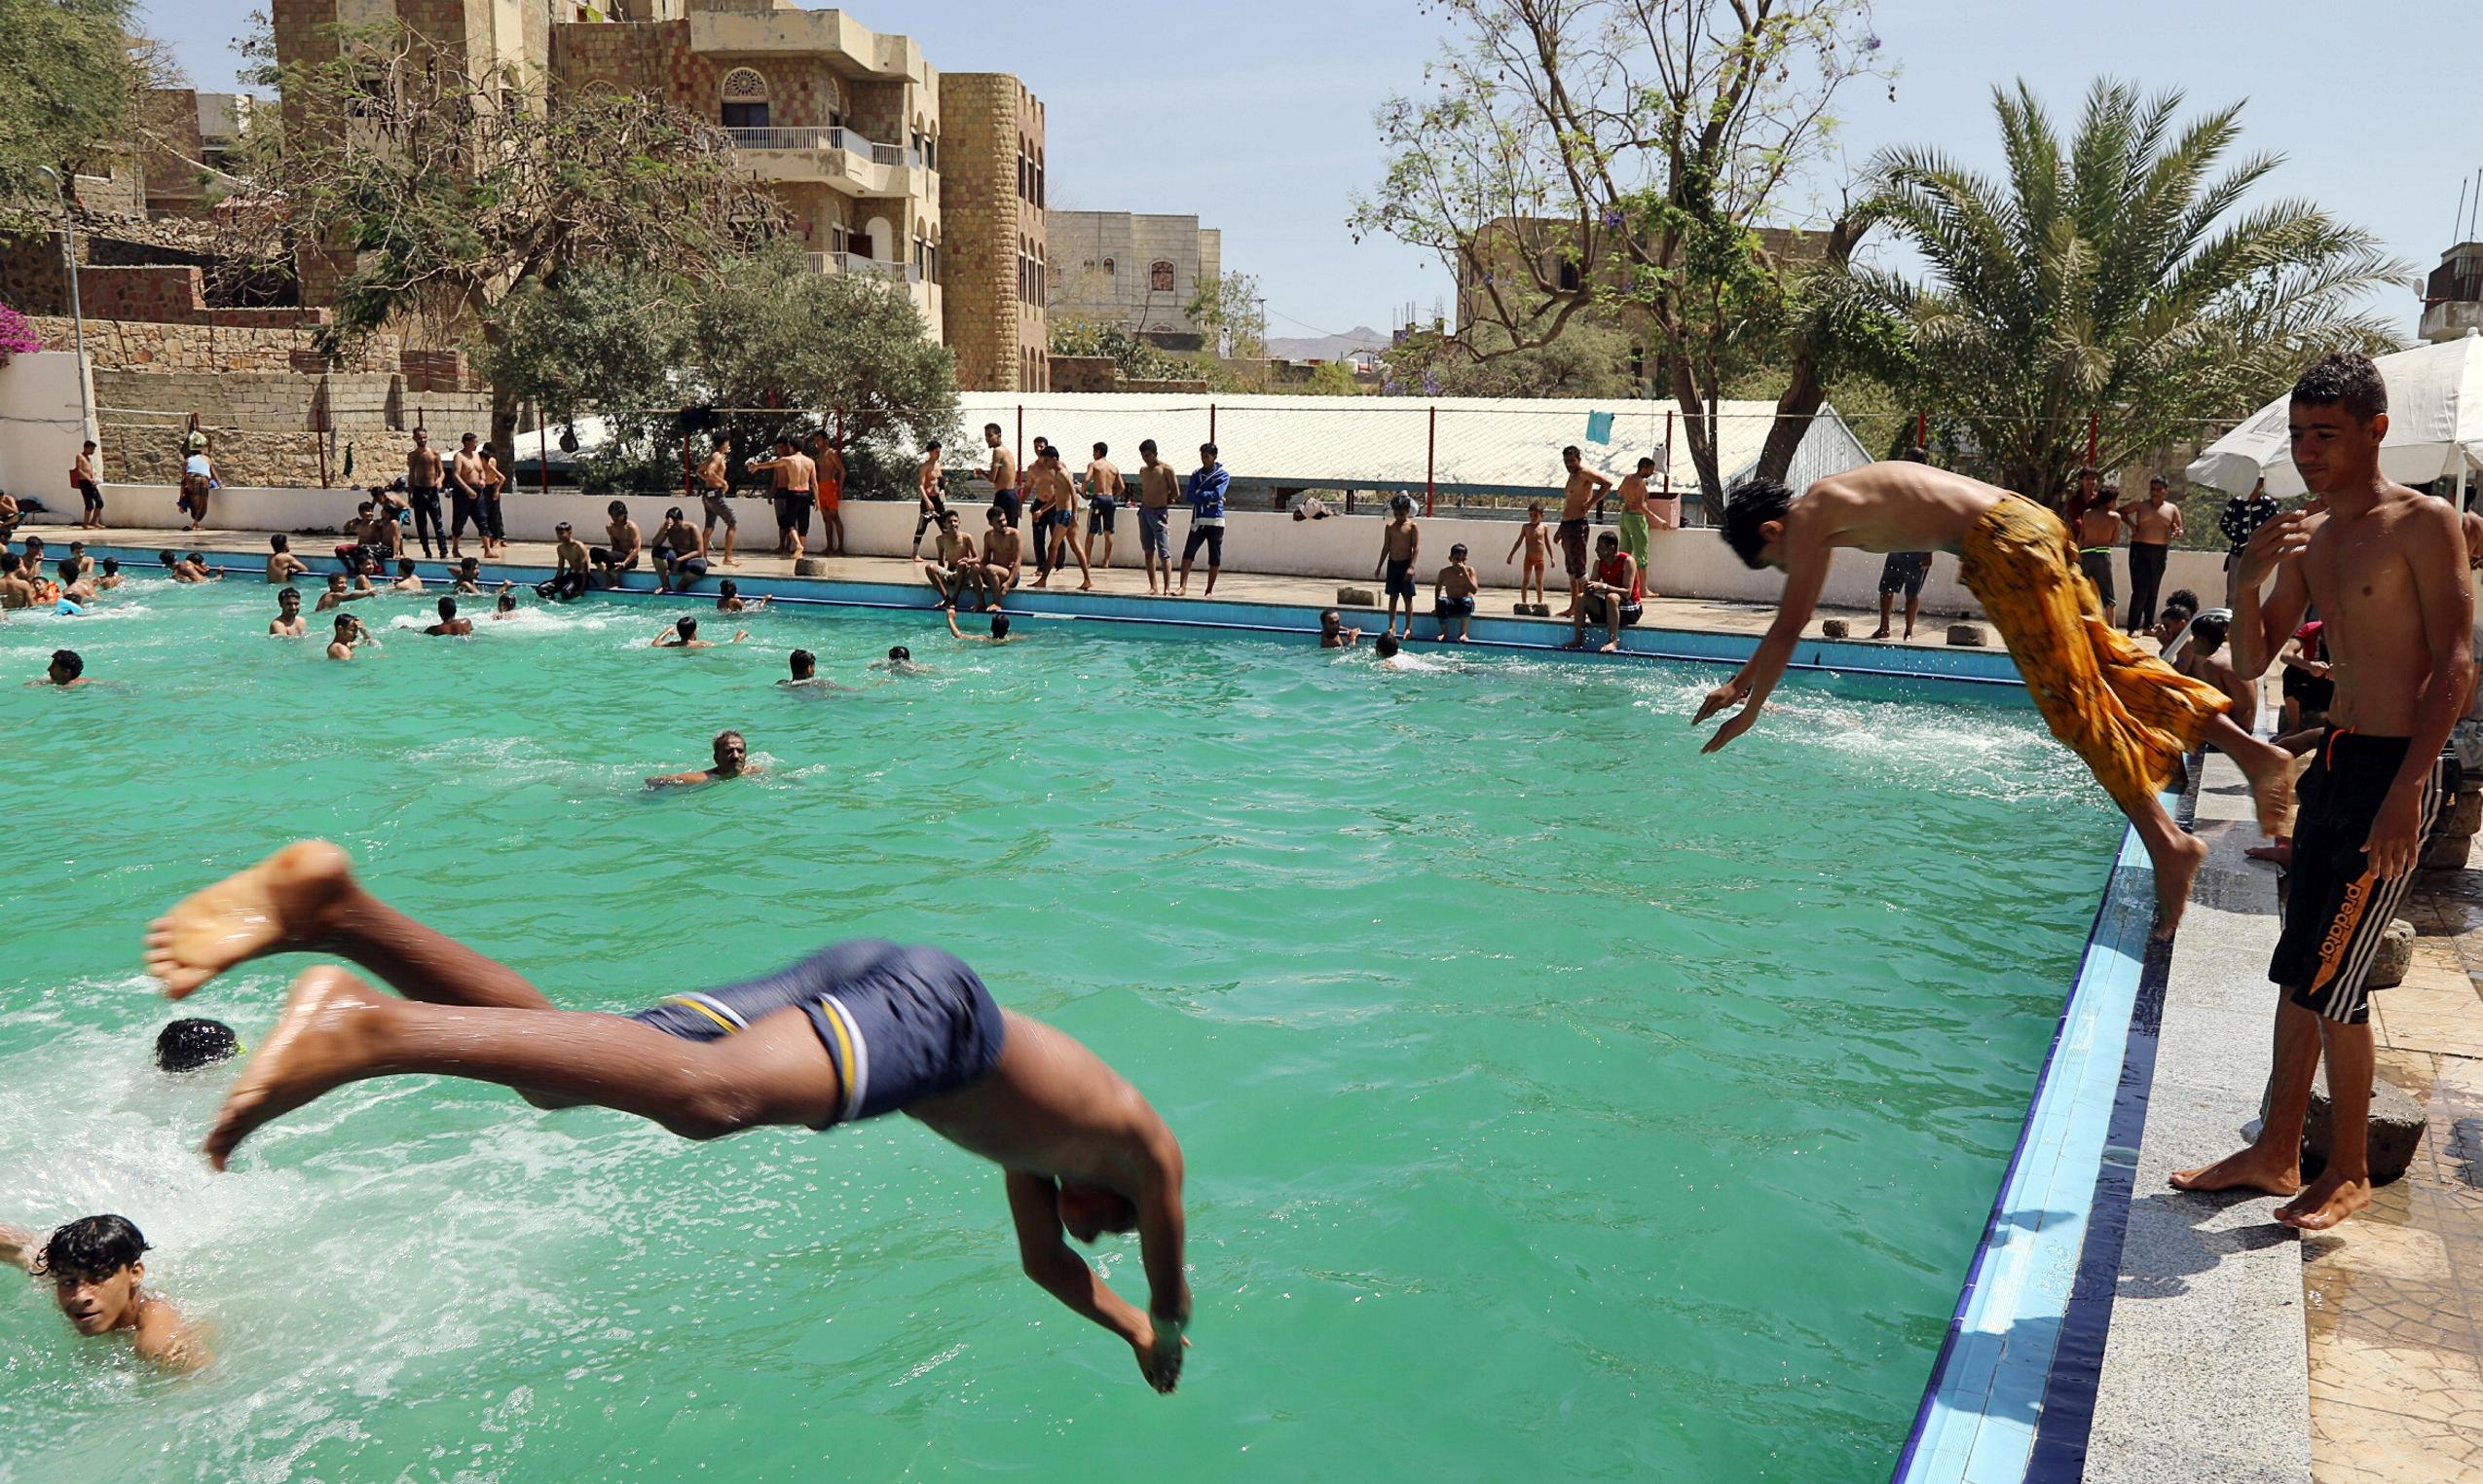 flipboard sole swimming pool in yemen 39 s third city struggles to remain open